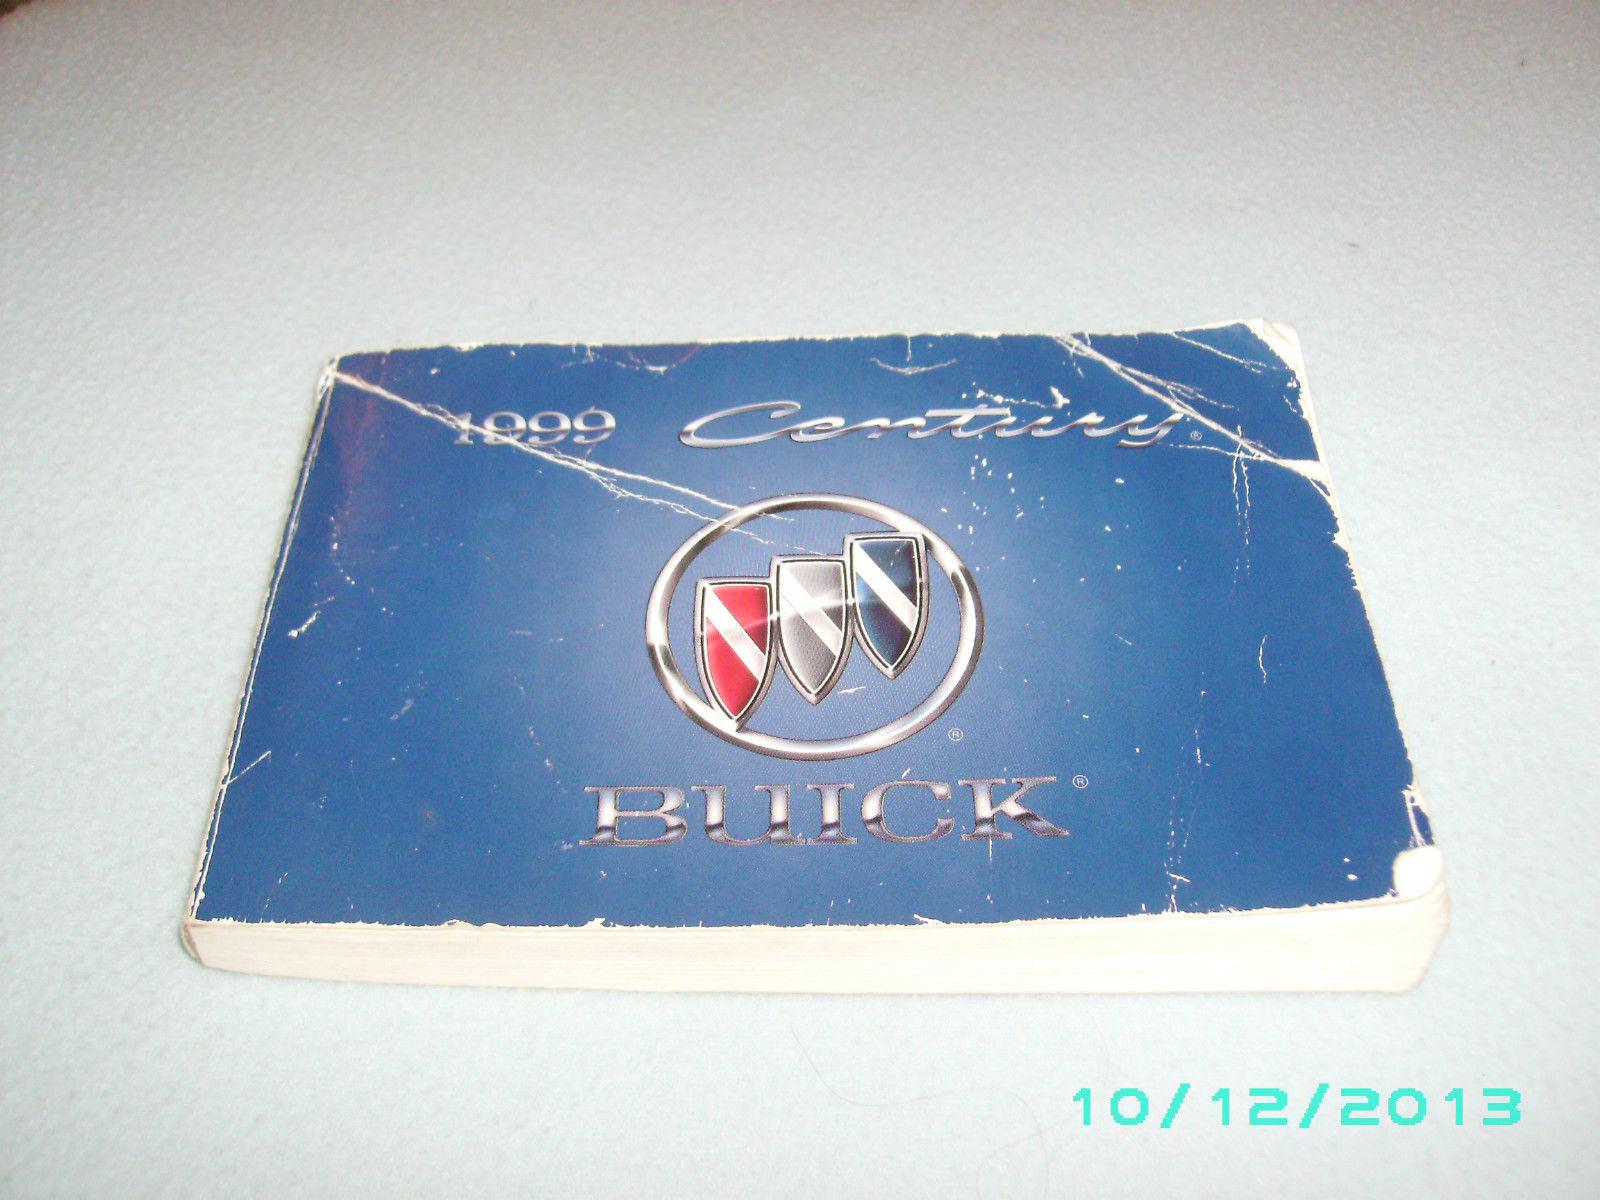 1999 buick century owners manual and 50 similar items rh bonanza com 1999 Buick Century Wiring-Diagram 1999 buick century service manual